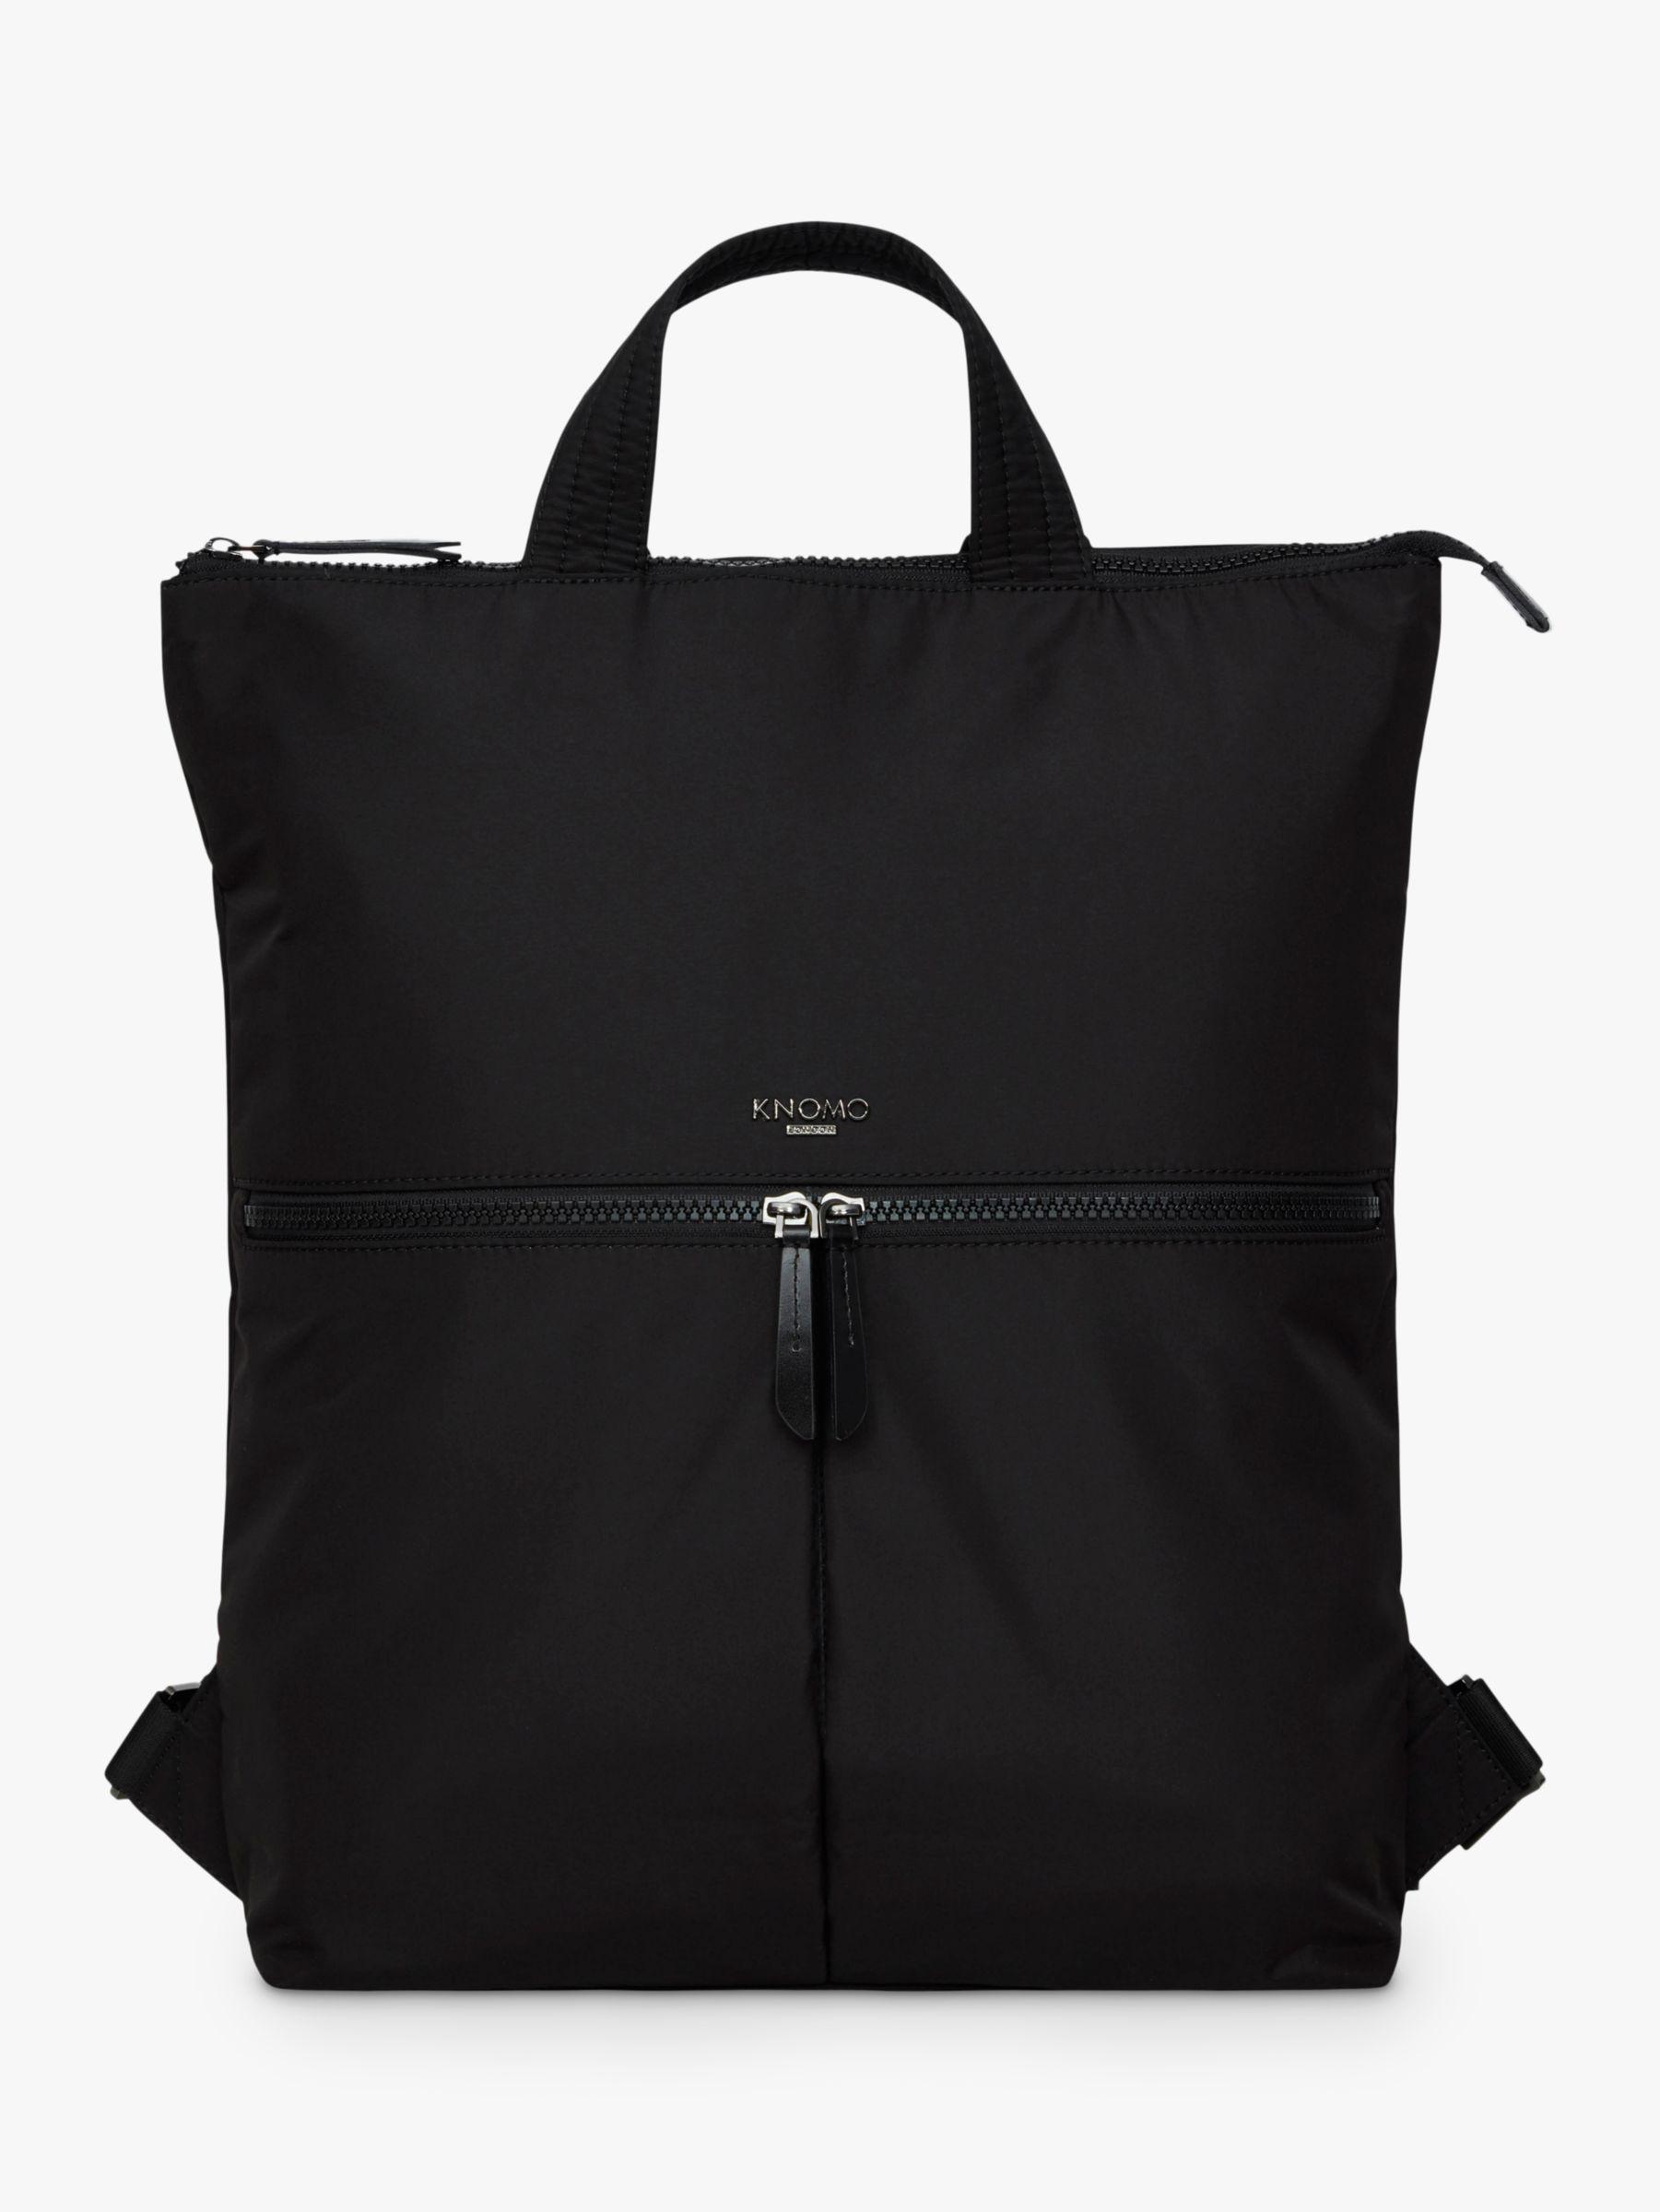 Knomo Knomo Reykjavik Backpack / Tote 15 Laptops, Black